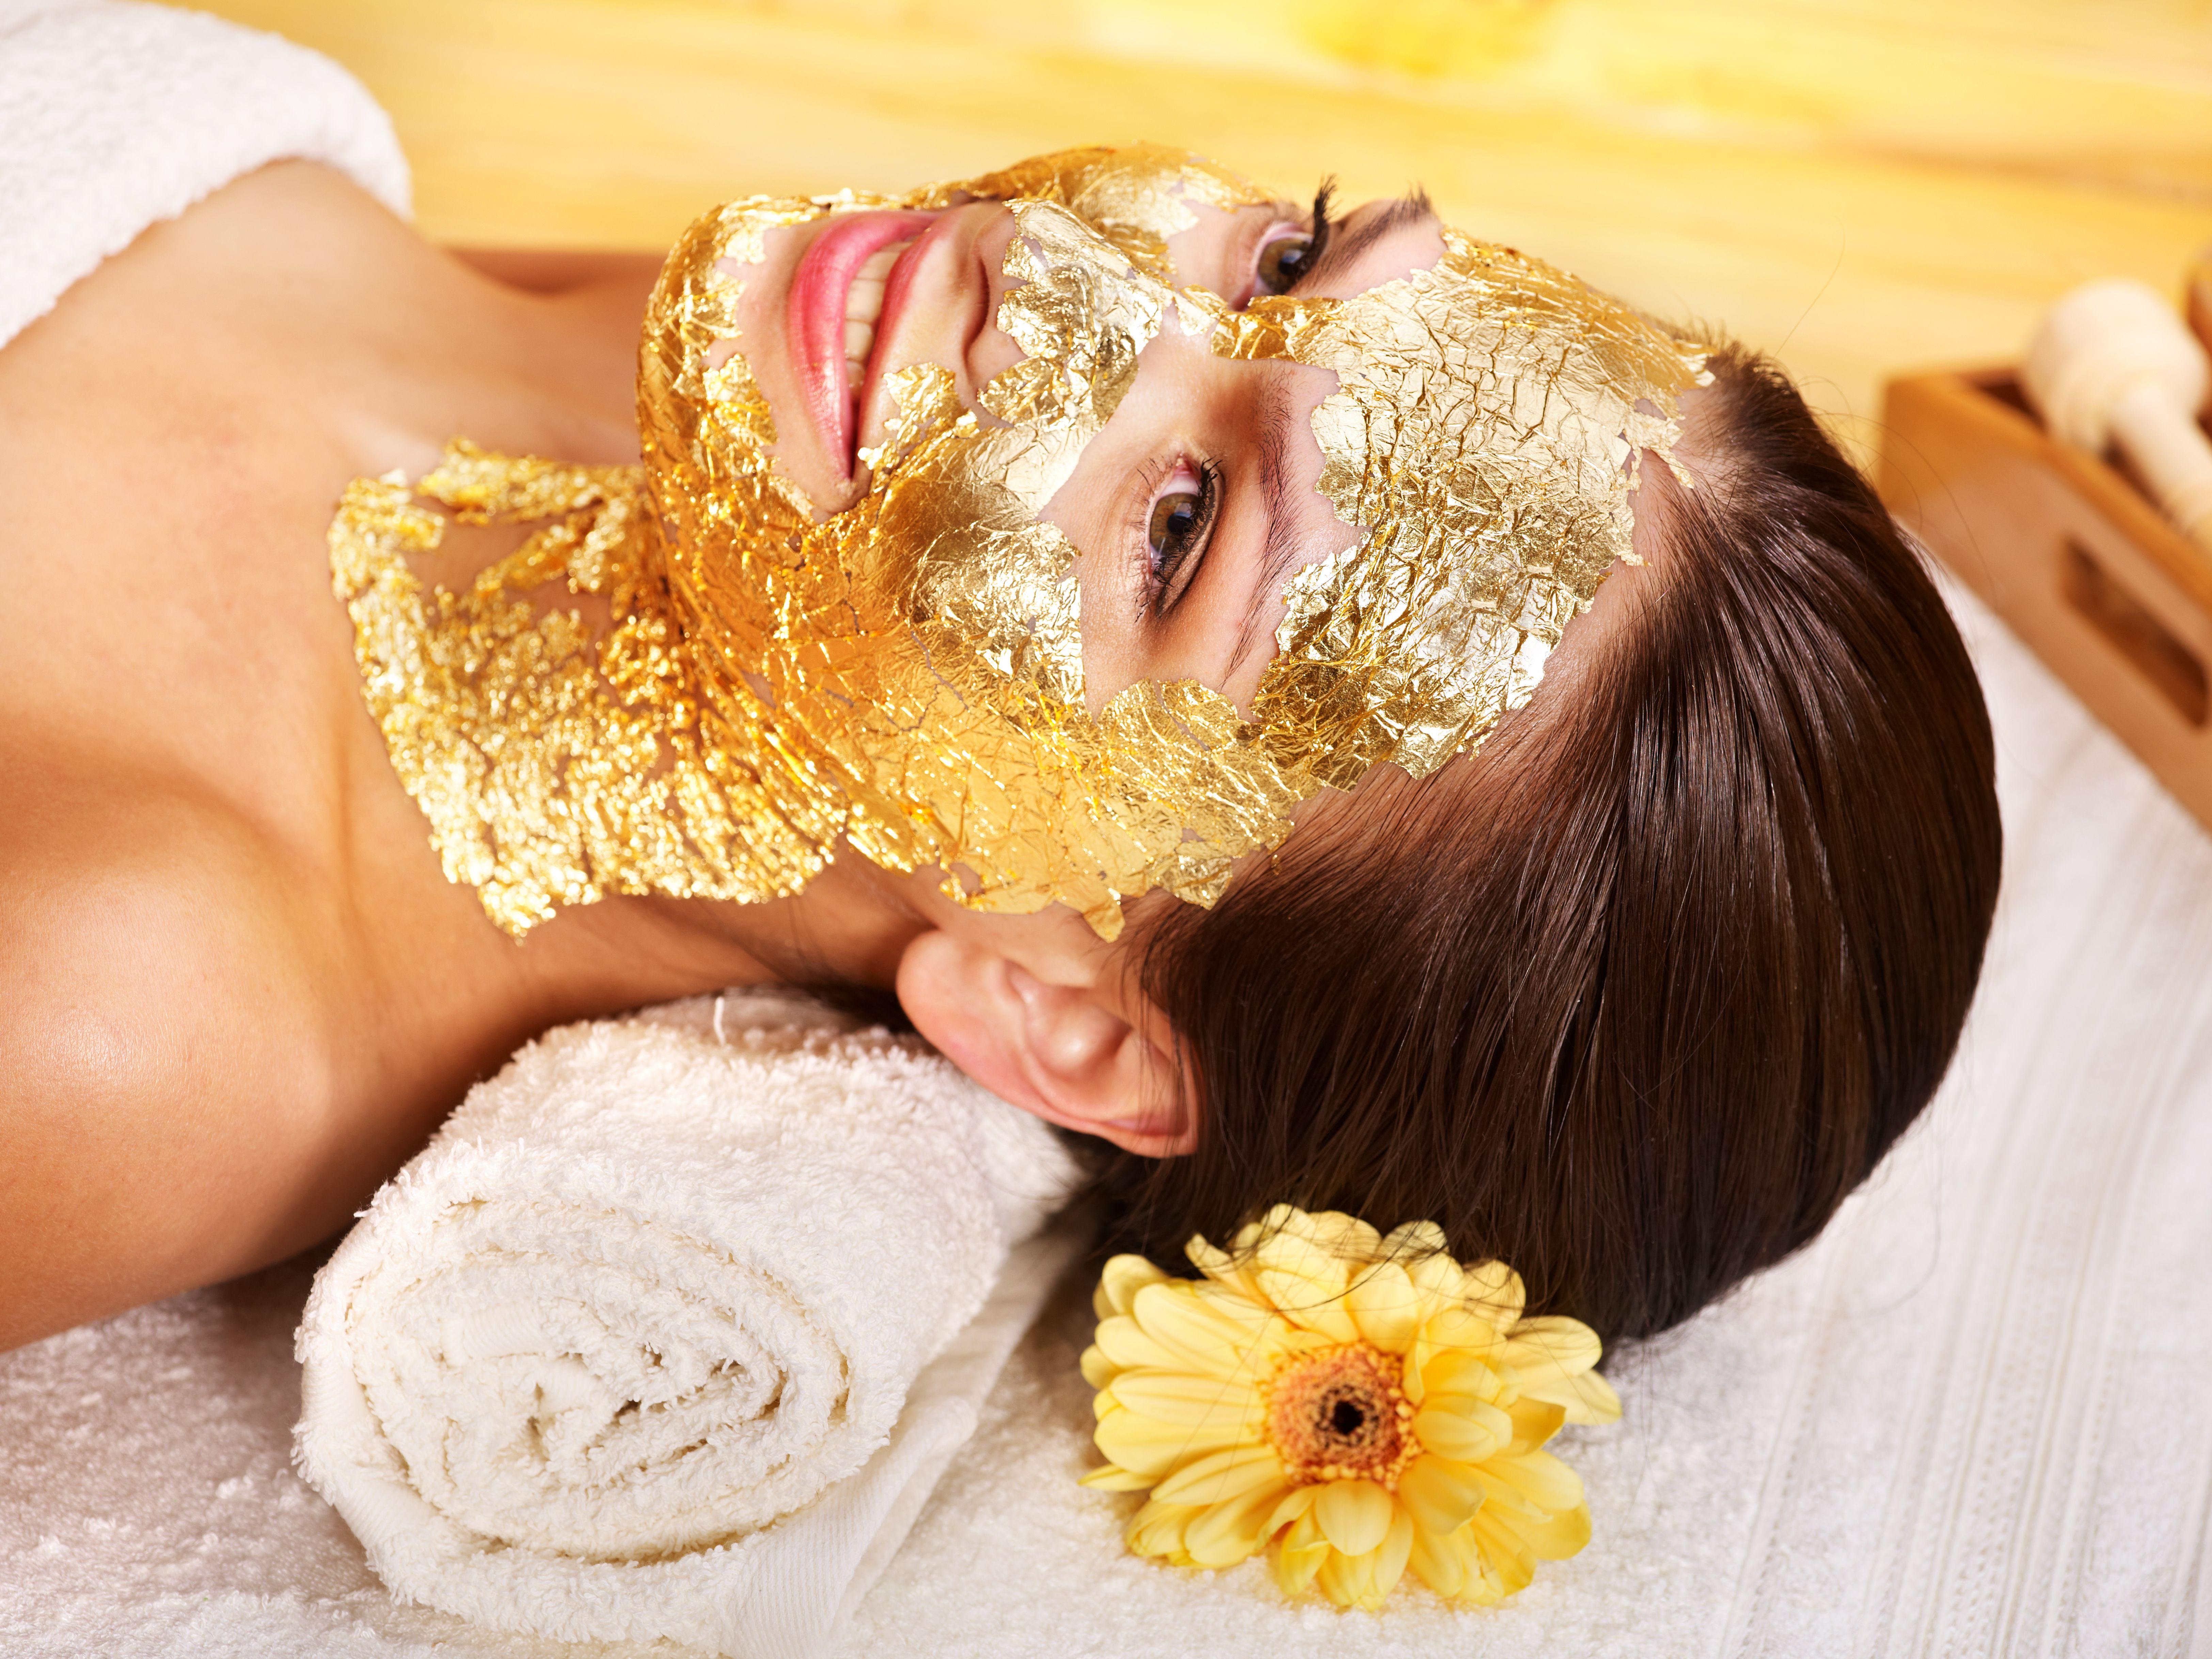 Tratamiento facial con oro: Servicios de Centro de Estética Carmen Martínez